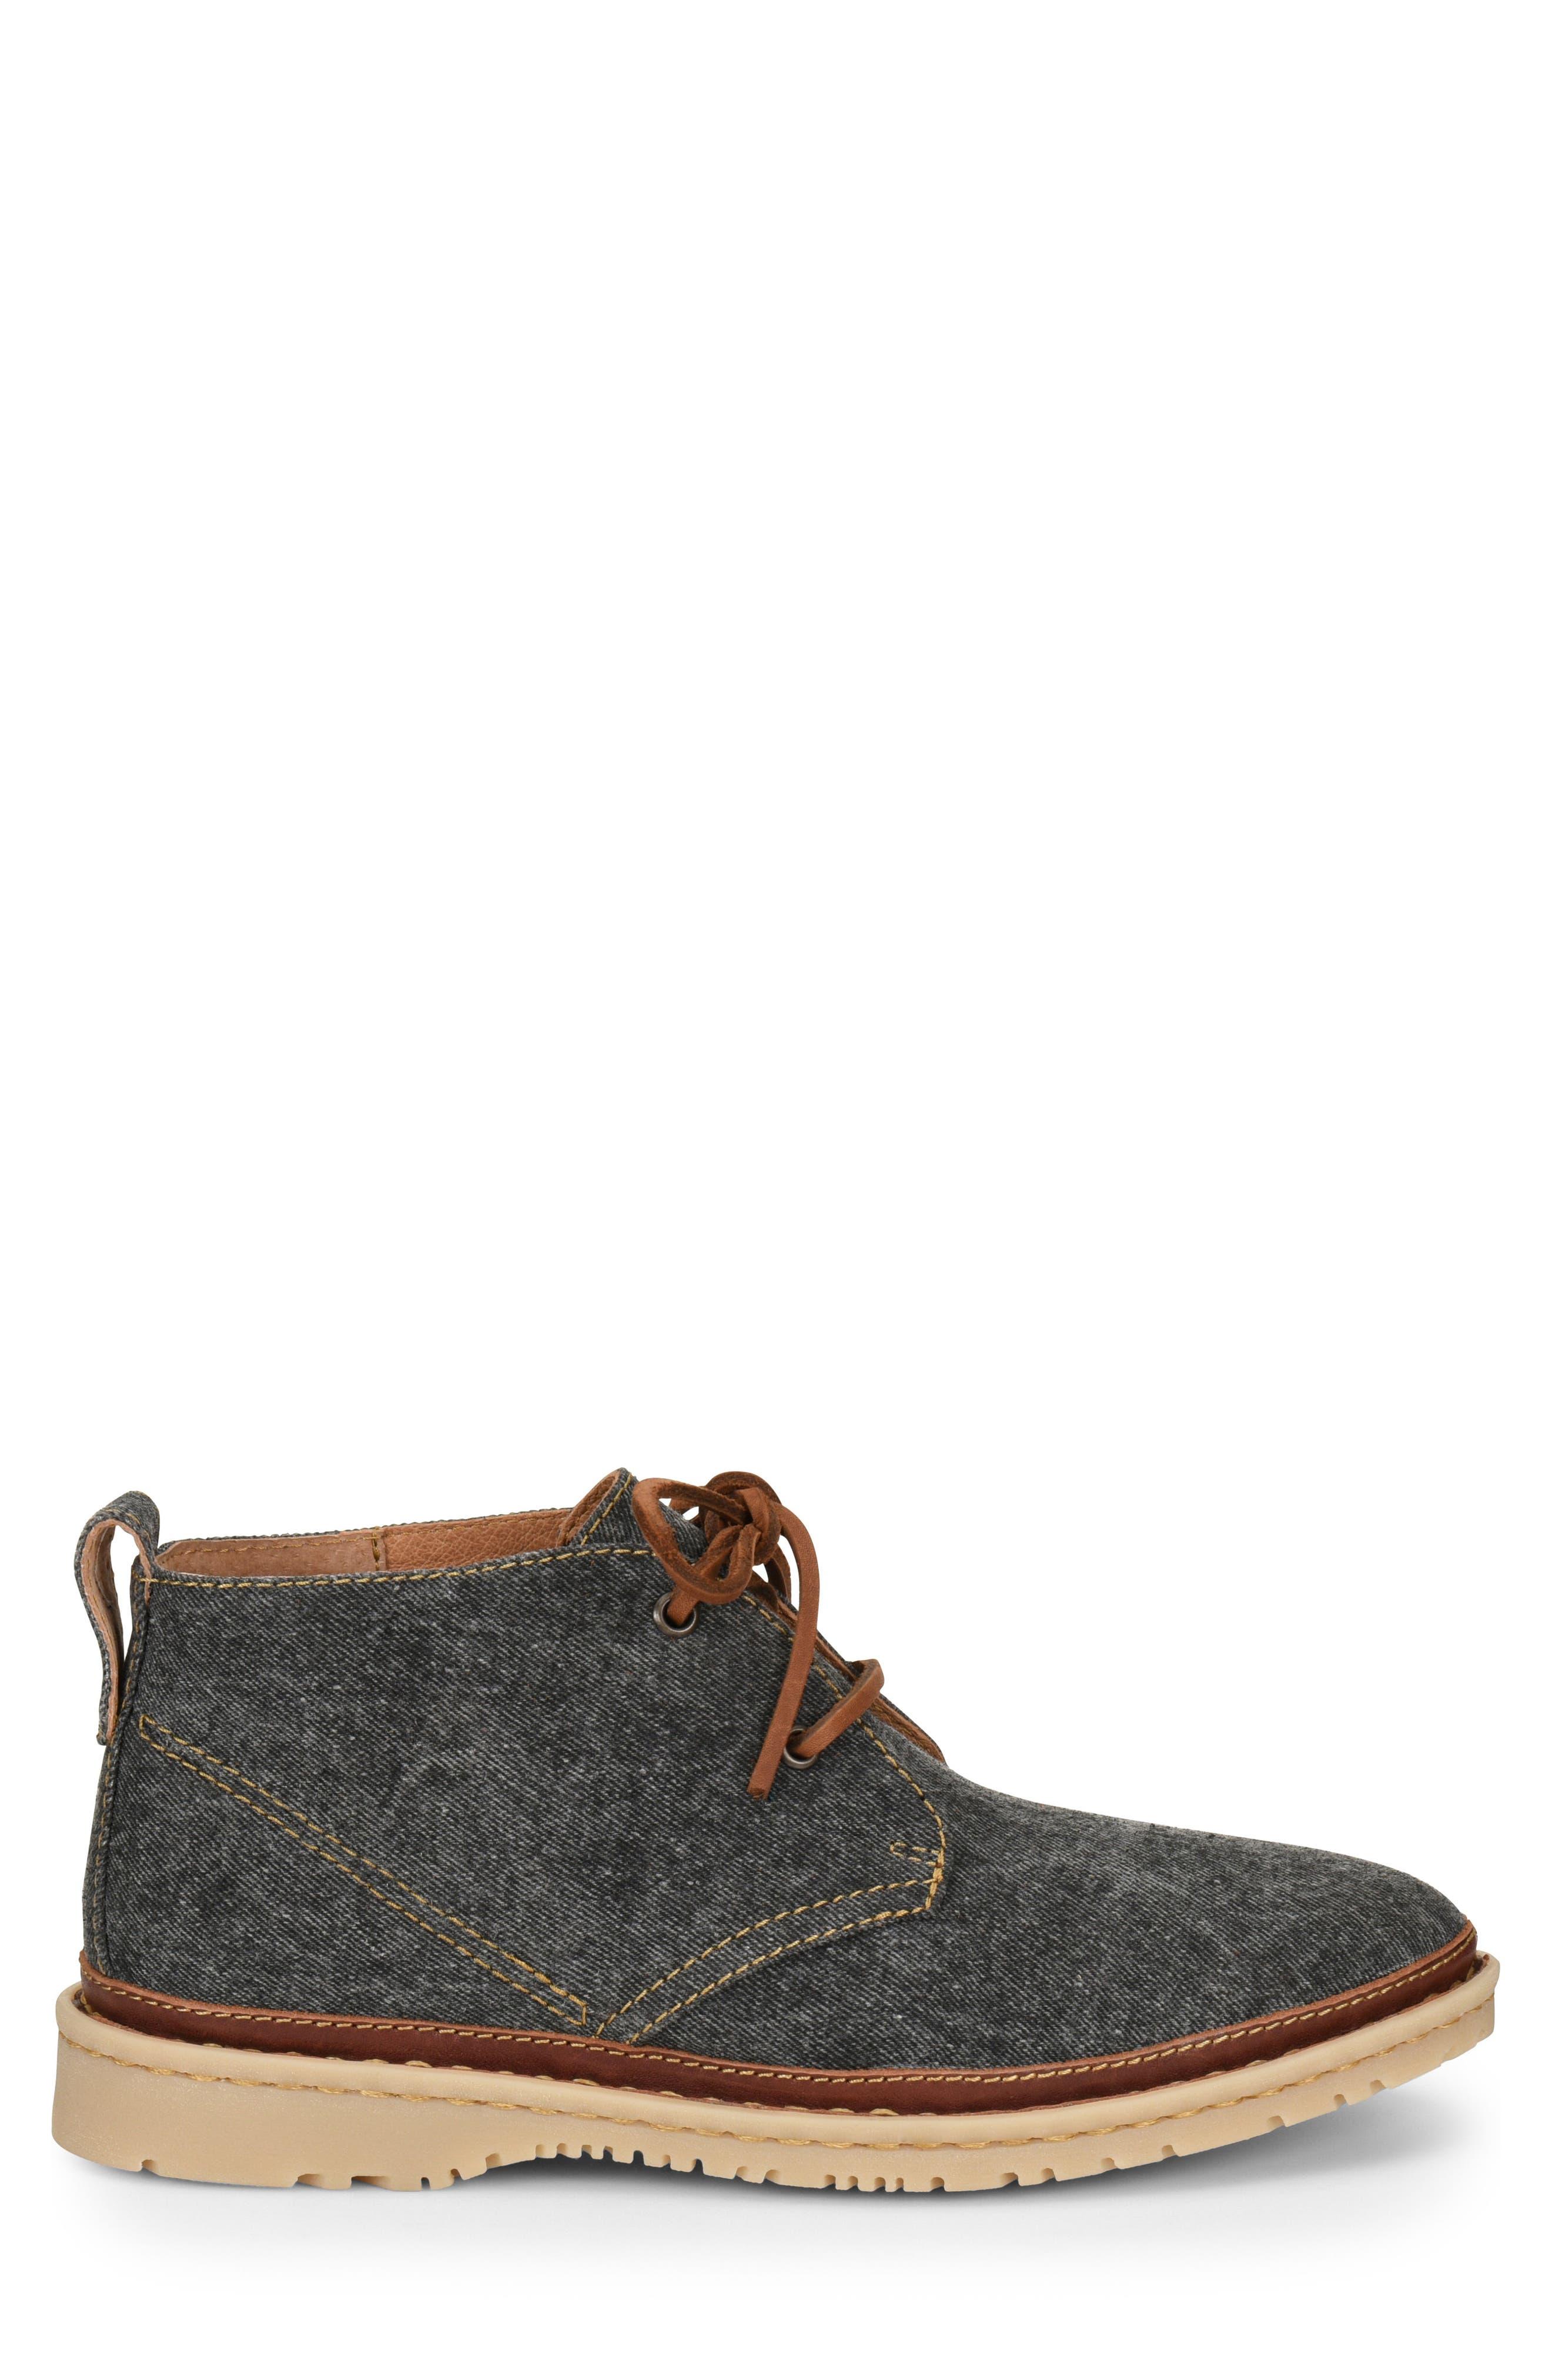 Elk II Chukka Boot,                             Alternate thumbnail 3, color,                             Dark Grey Fabric